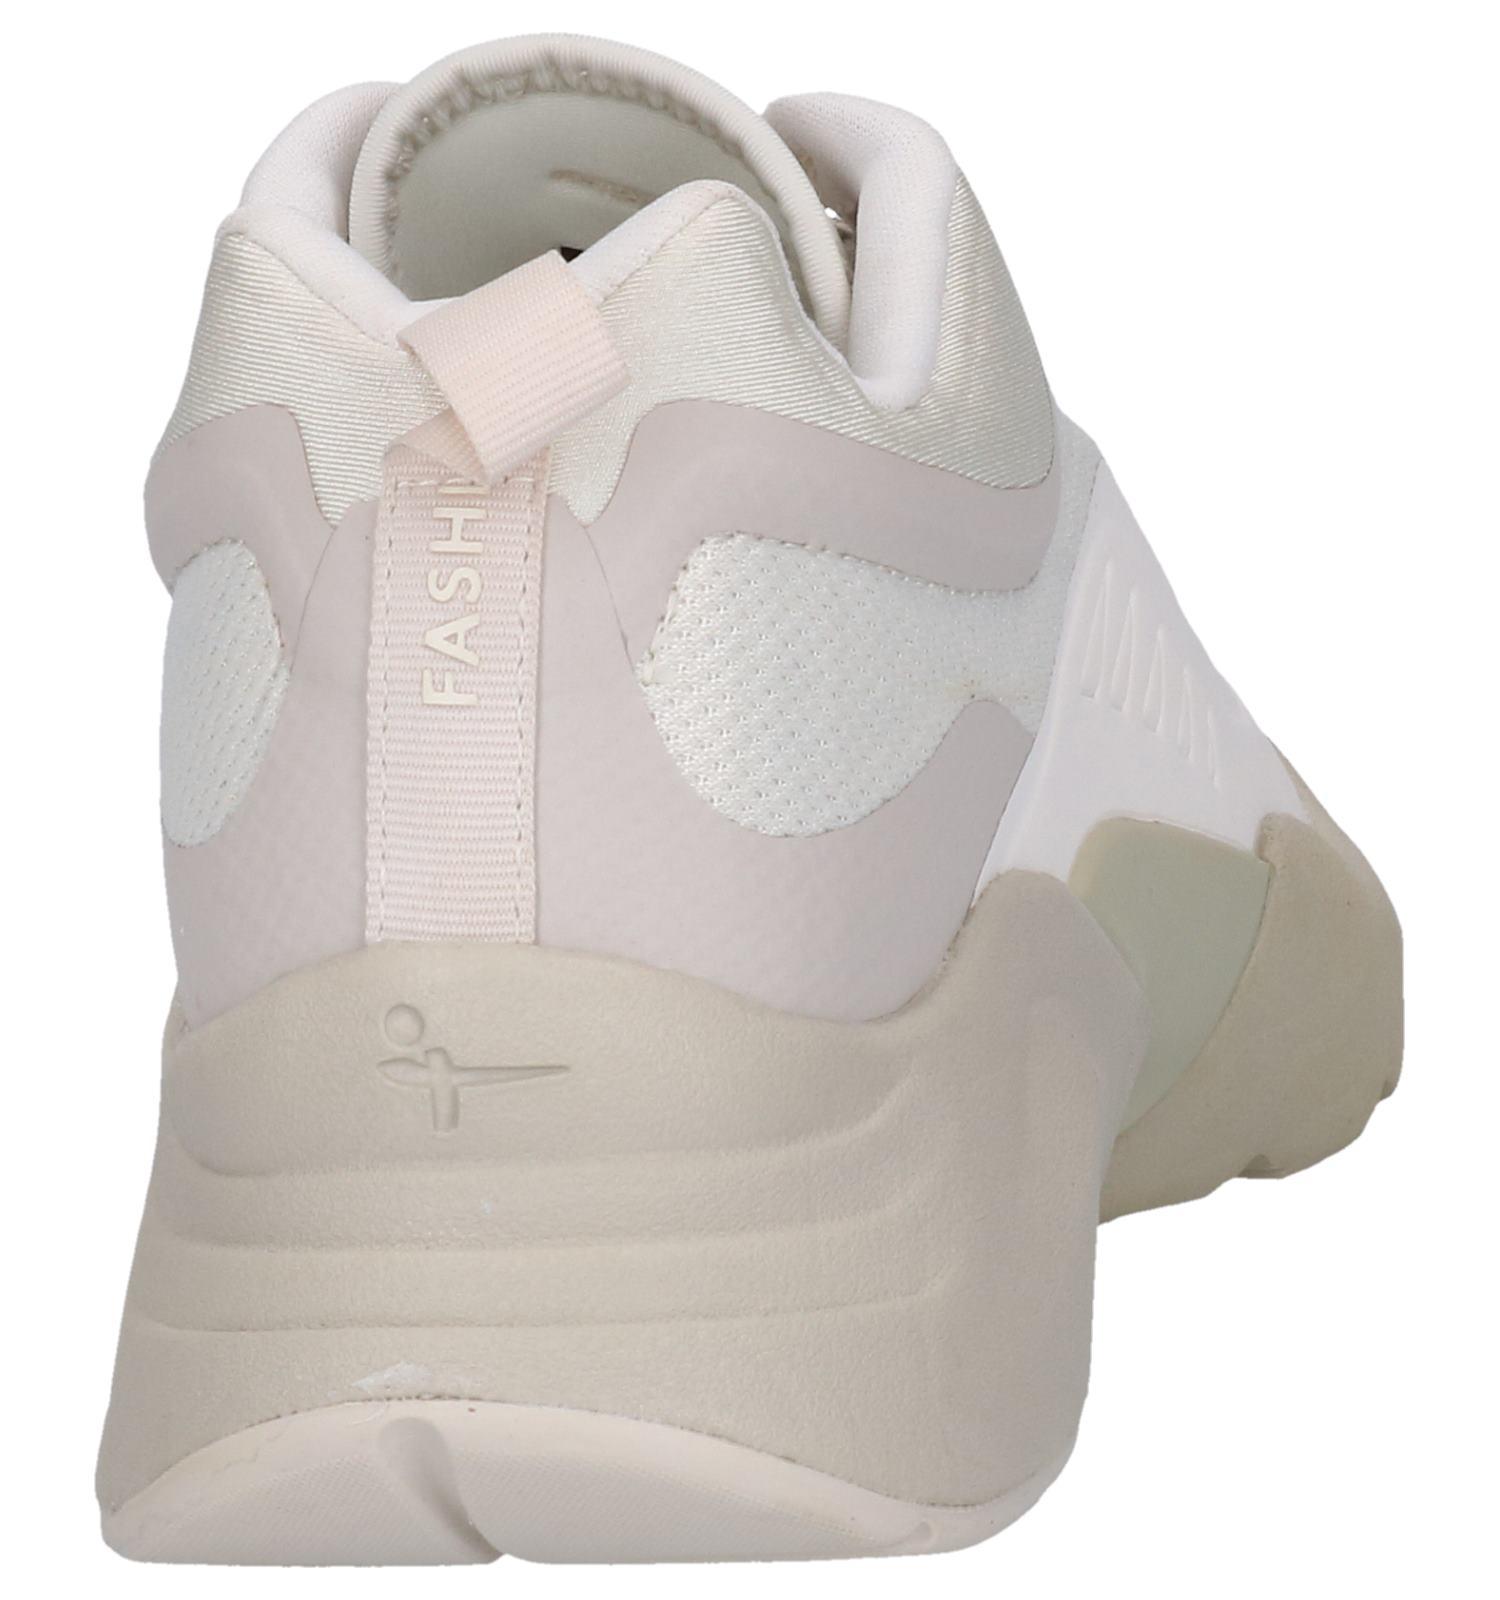 Ecru Tamaris Sneakers Tamaris Fashletics Sneakers Ecru SzMUpqGV